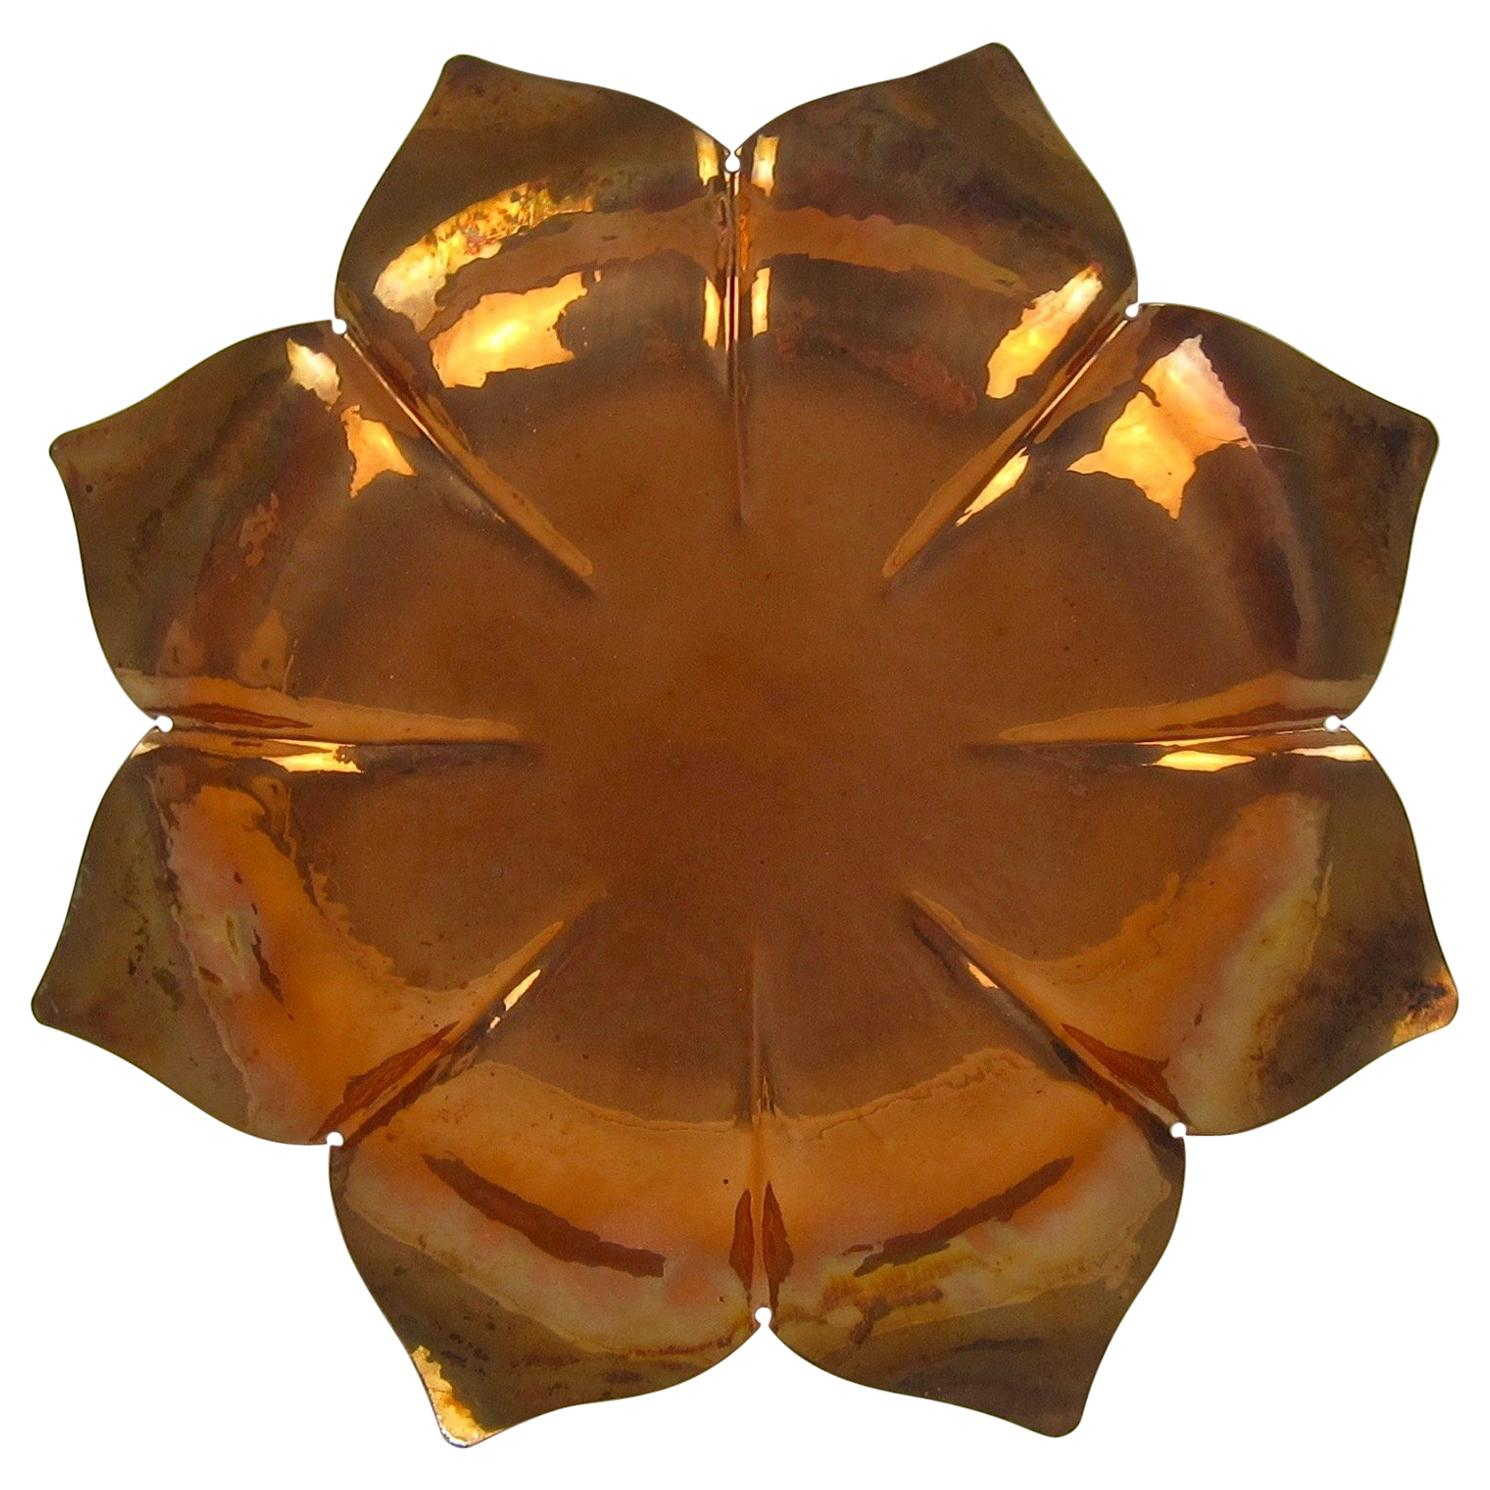 American Art Metal Lotus Platter Dish by Marie Zimmermann